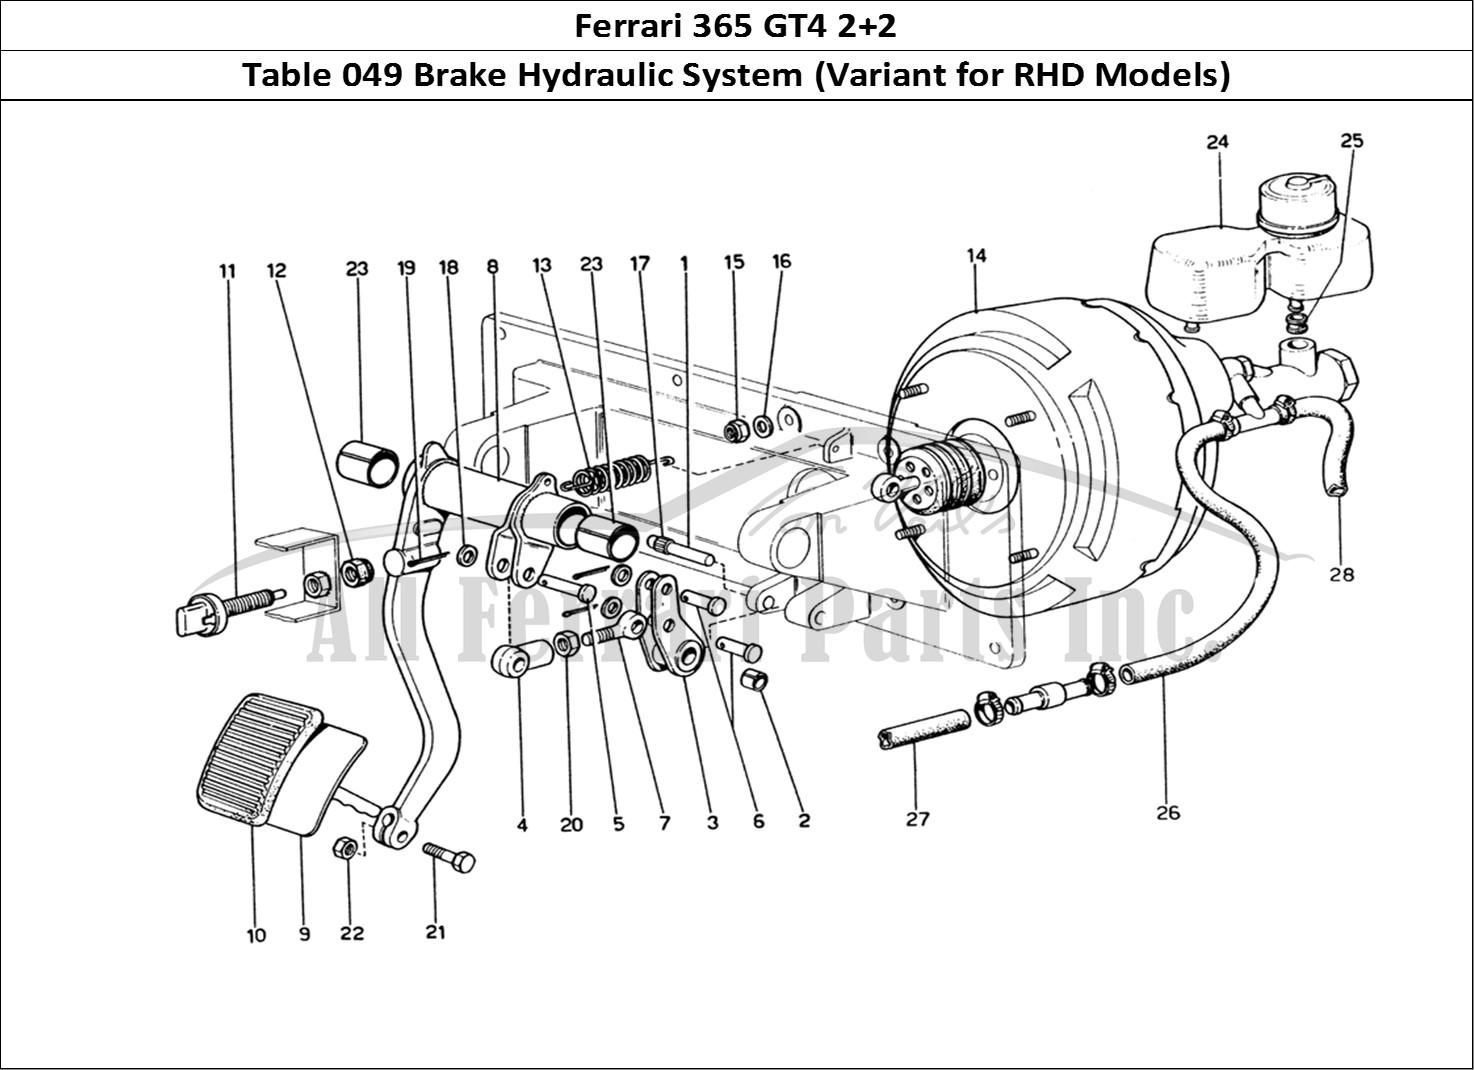 hight resolution of ferrari 365 gt4 2 2 mechanical table 049 brake hydraulic system variant for rhd models